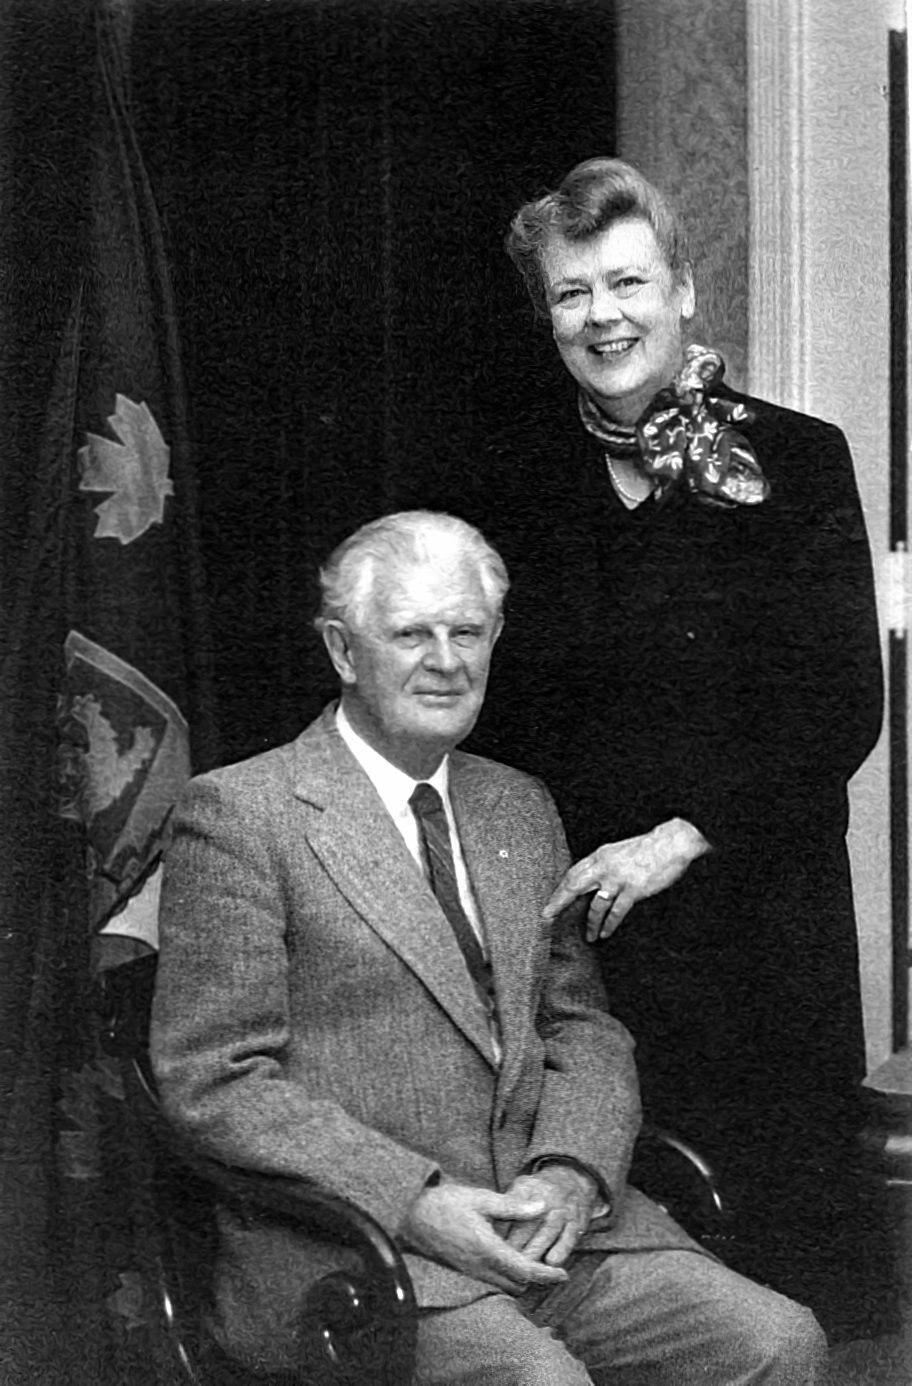 Ruth & George Stanley